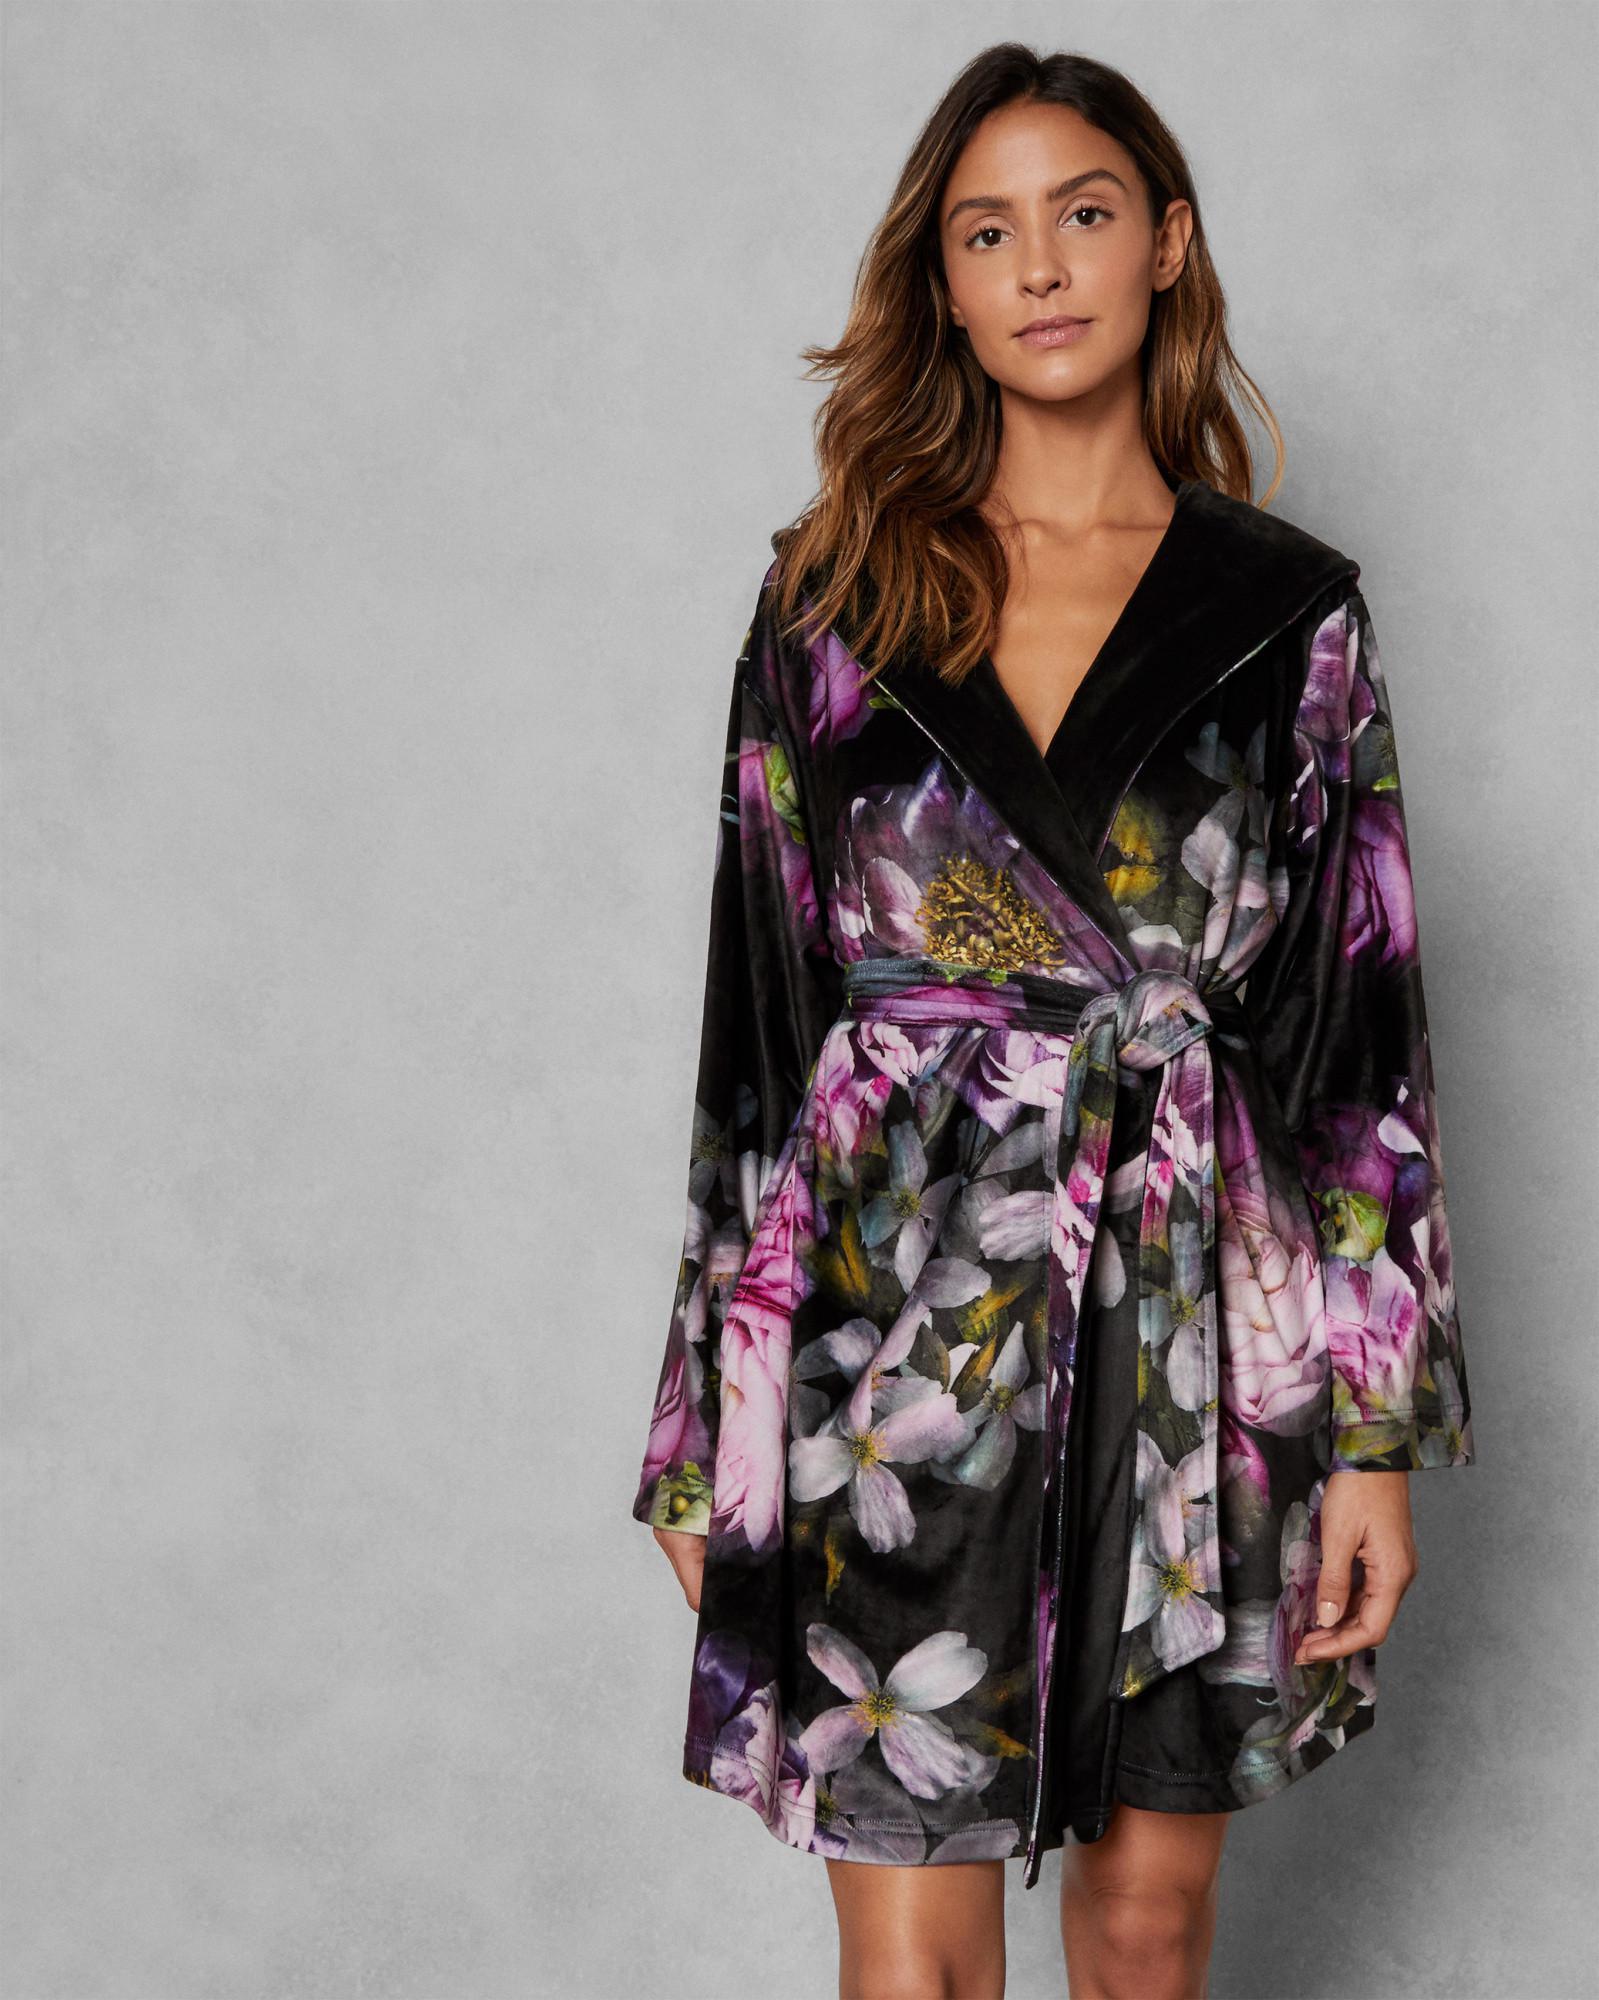 df8825c31780b Ted Baker Sunlit Floral Dressing Gown in Black - Lyst